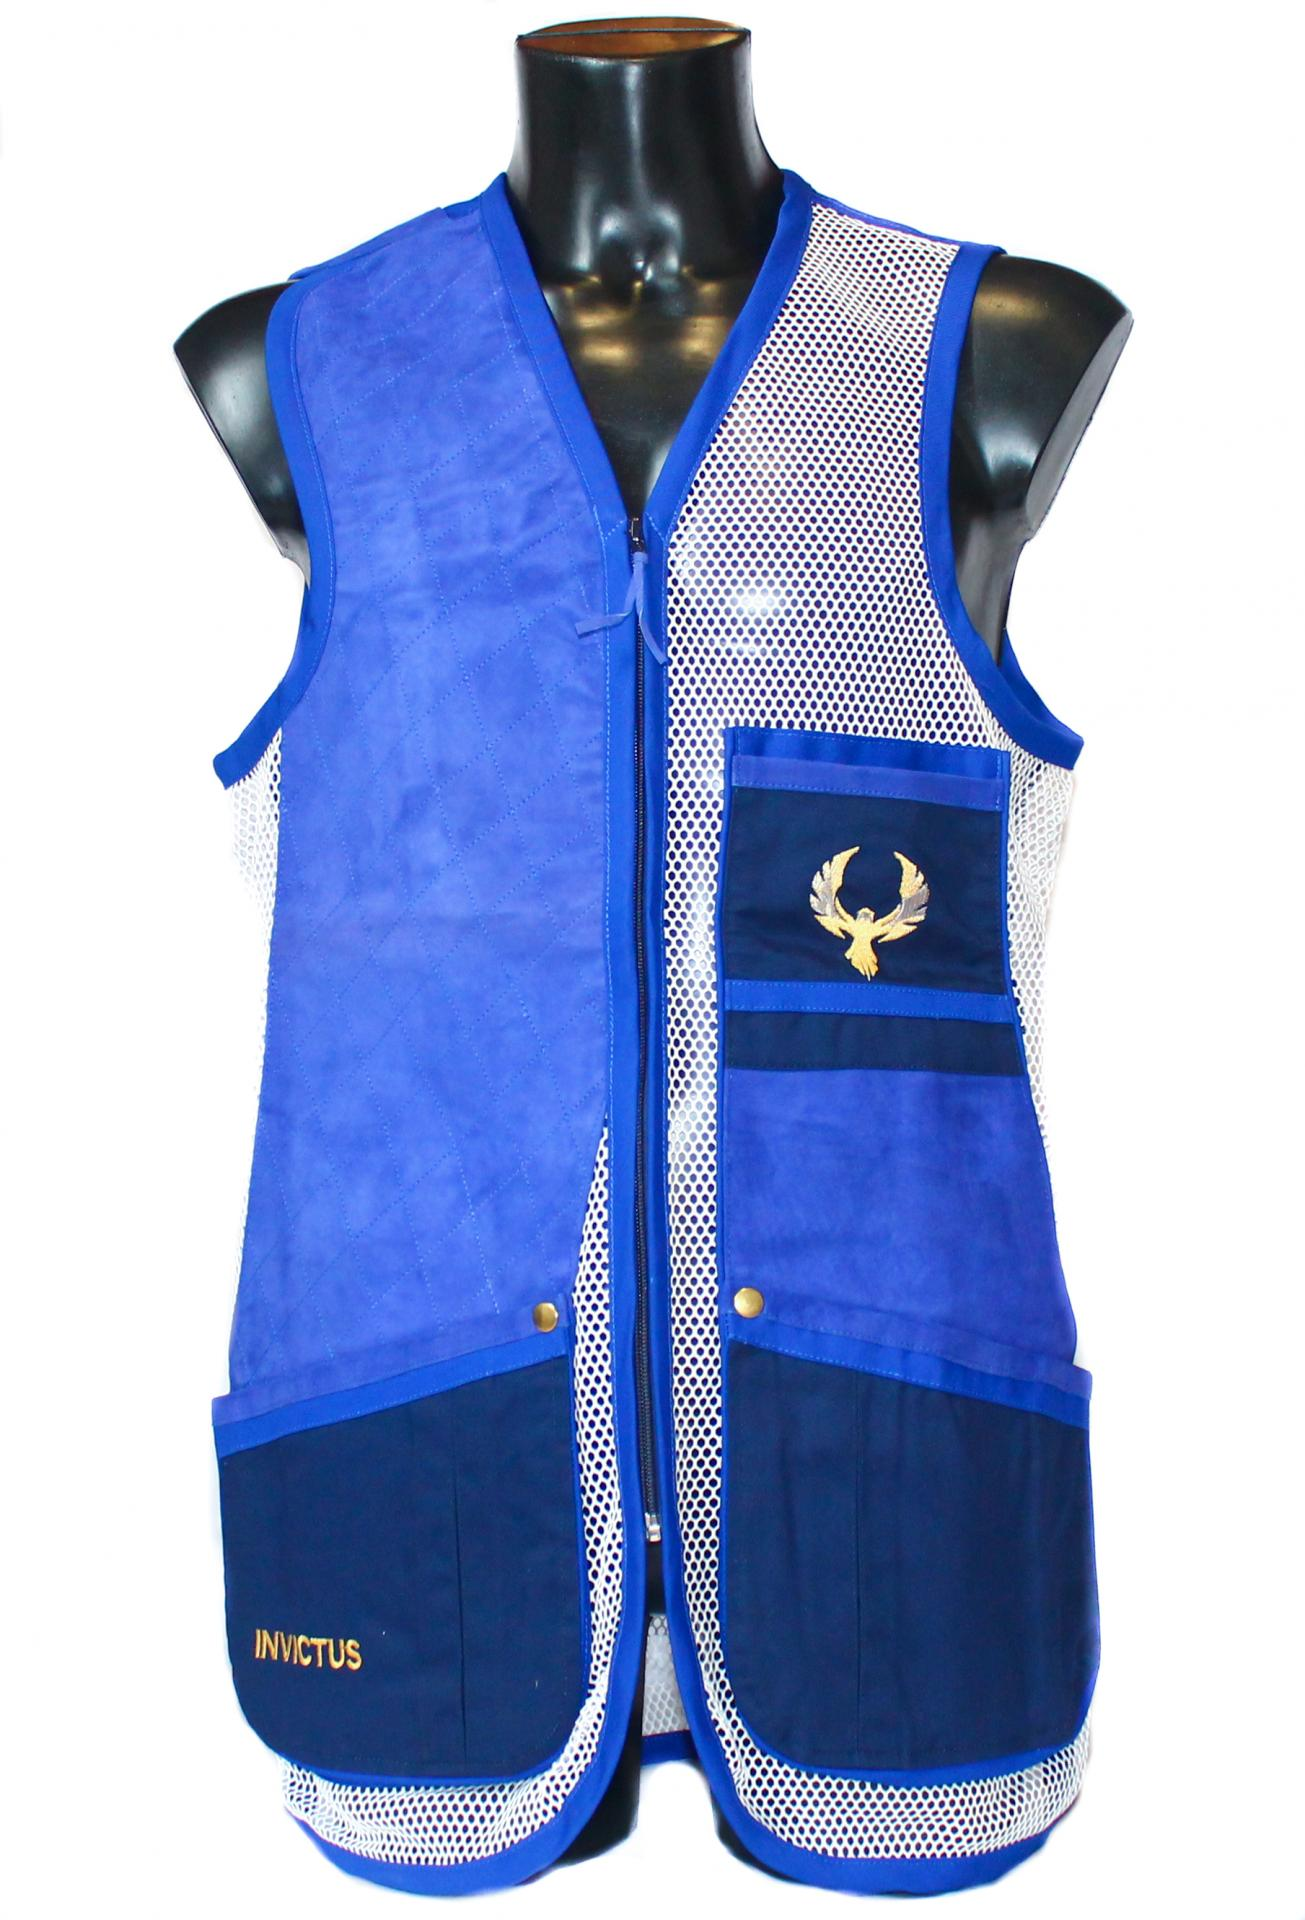 Chaleco GSS INVICTUS (Azul y Blanco)